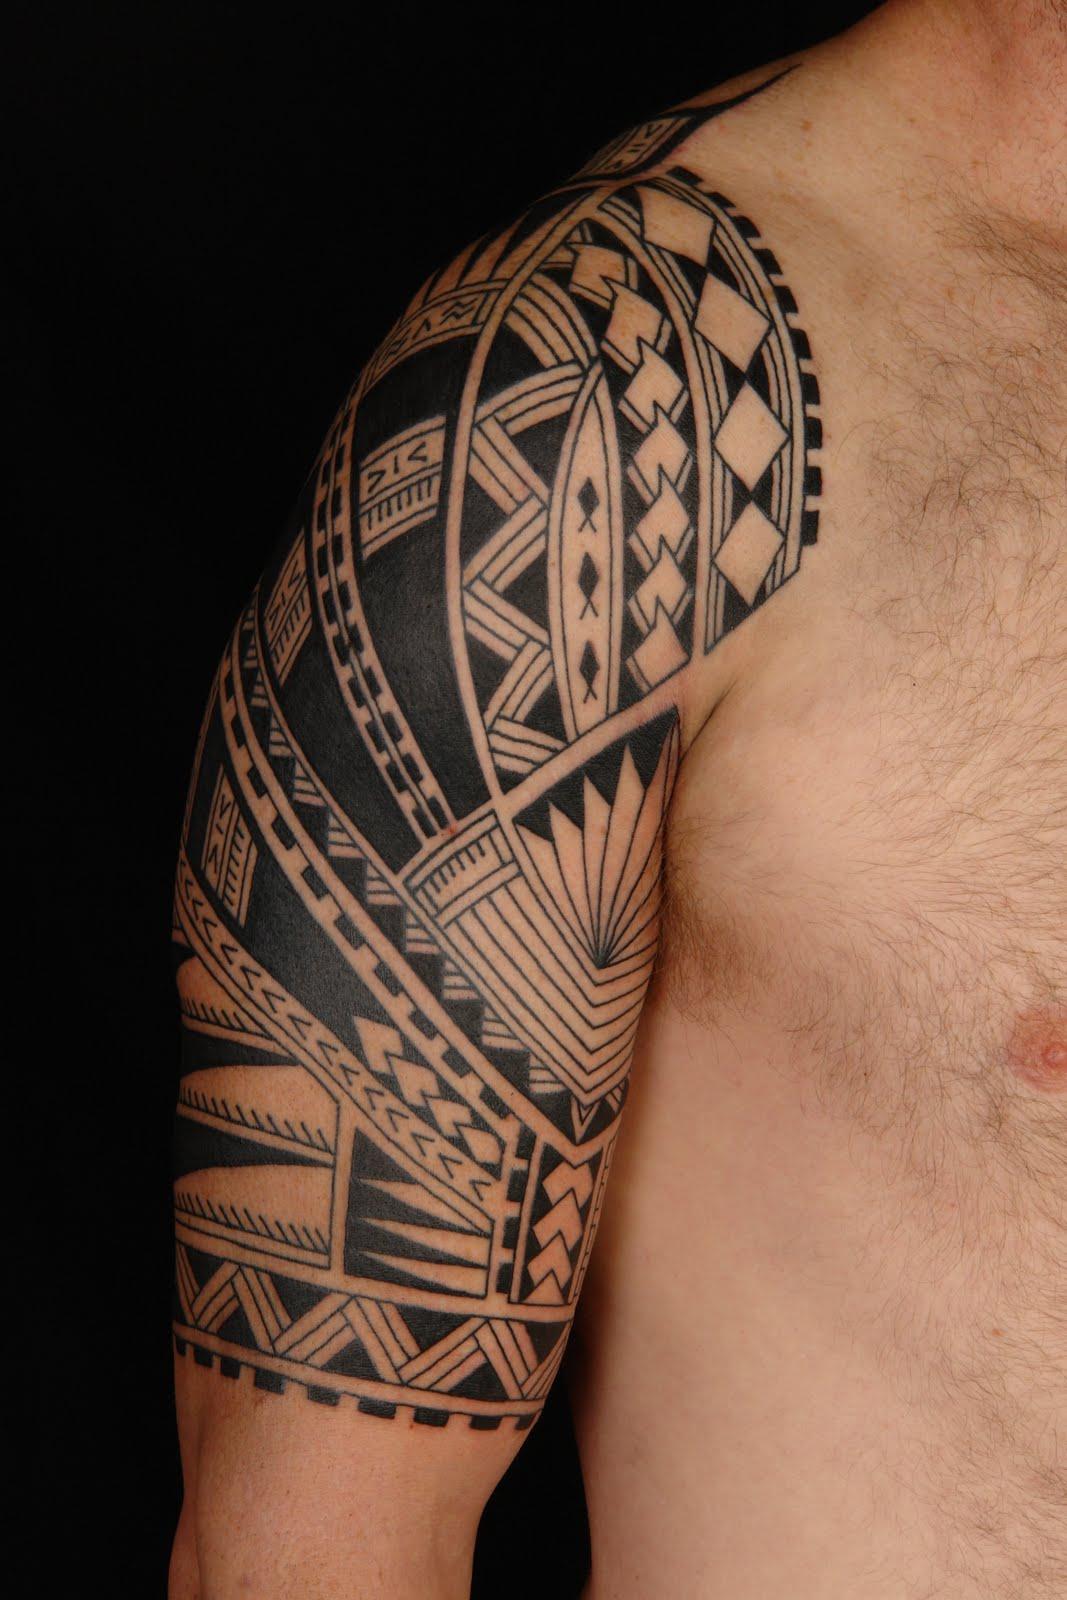 Maori polynesian tattoo samoan polynesian half sleeve tattoo for Polynesian tattoo designs